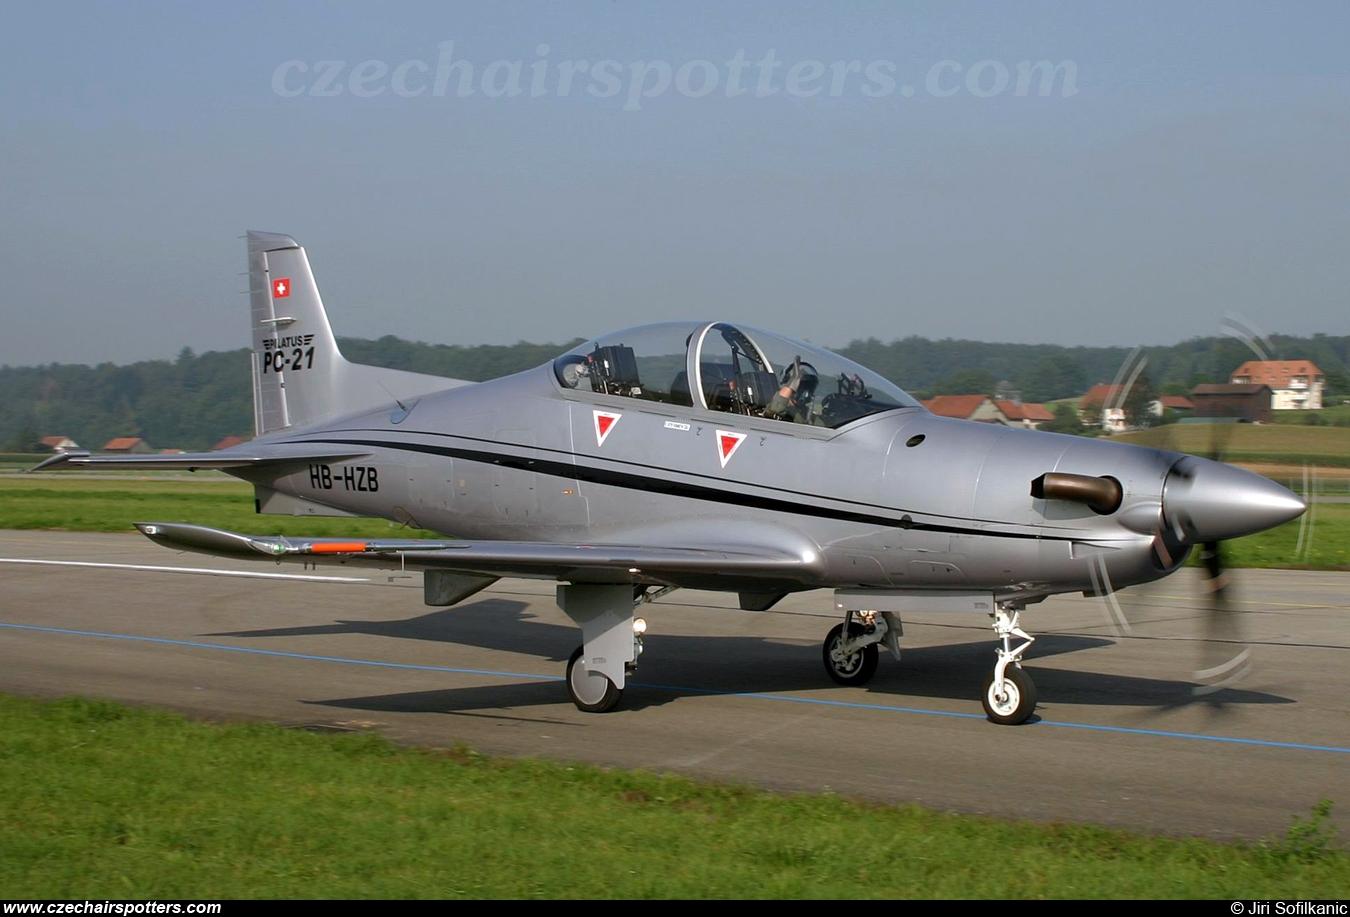 Pilatus aircraft – pilatus aircraft pilatus pc 21 hb hzb